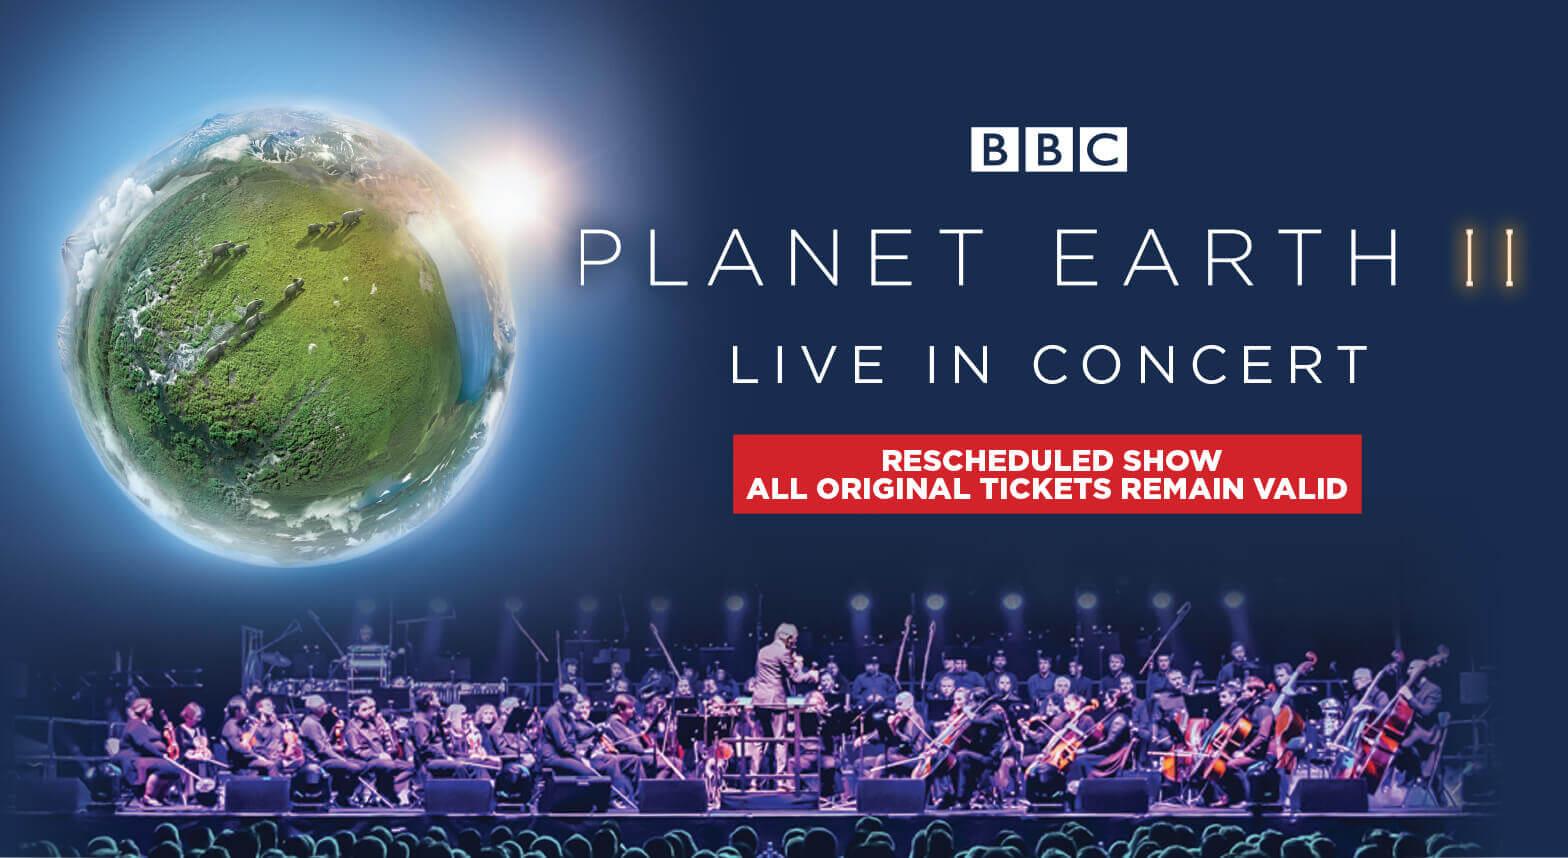 planet-earth-arenas-reschedule2.jpg